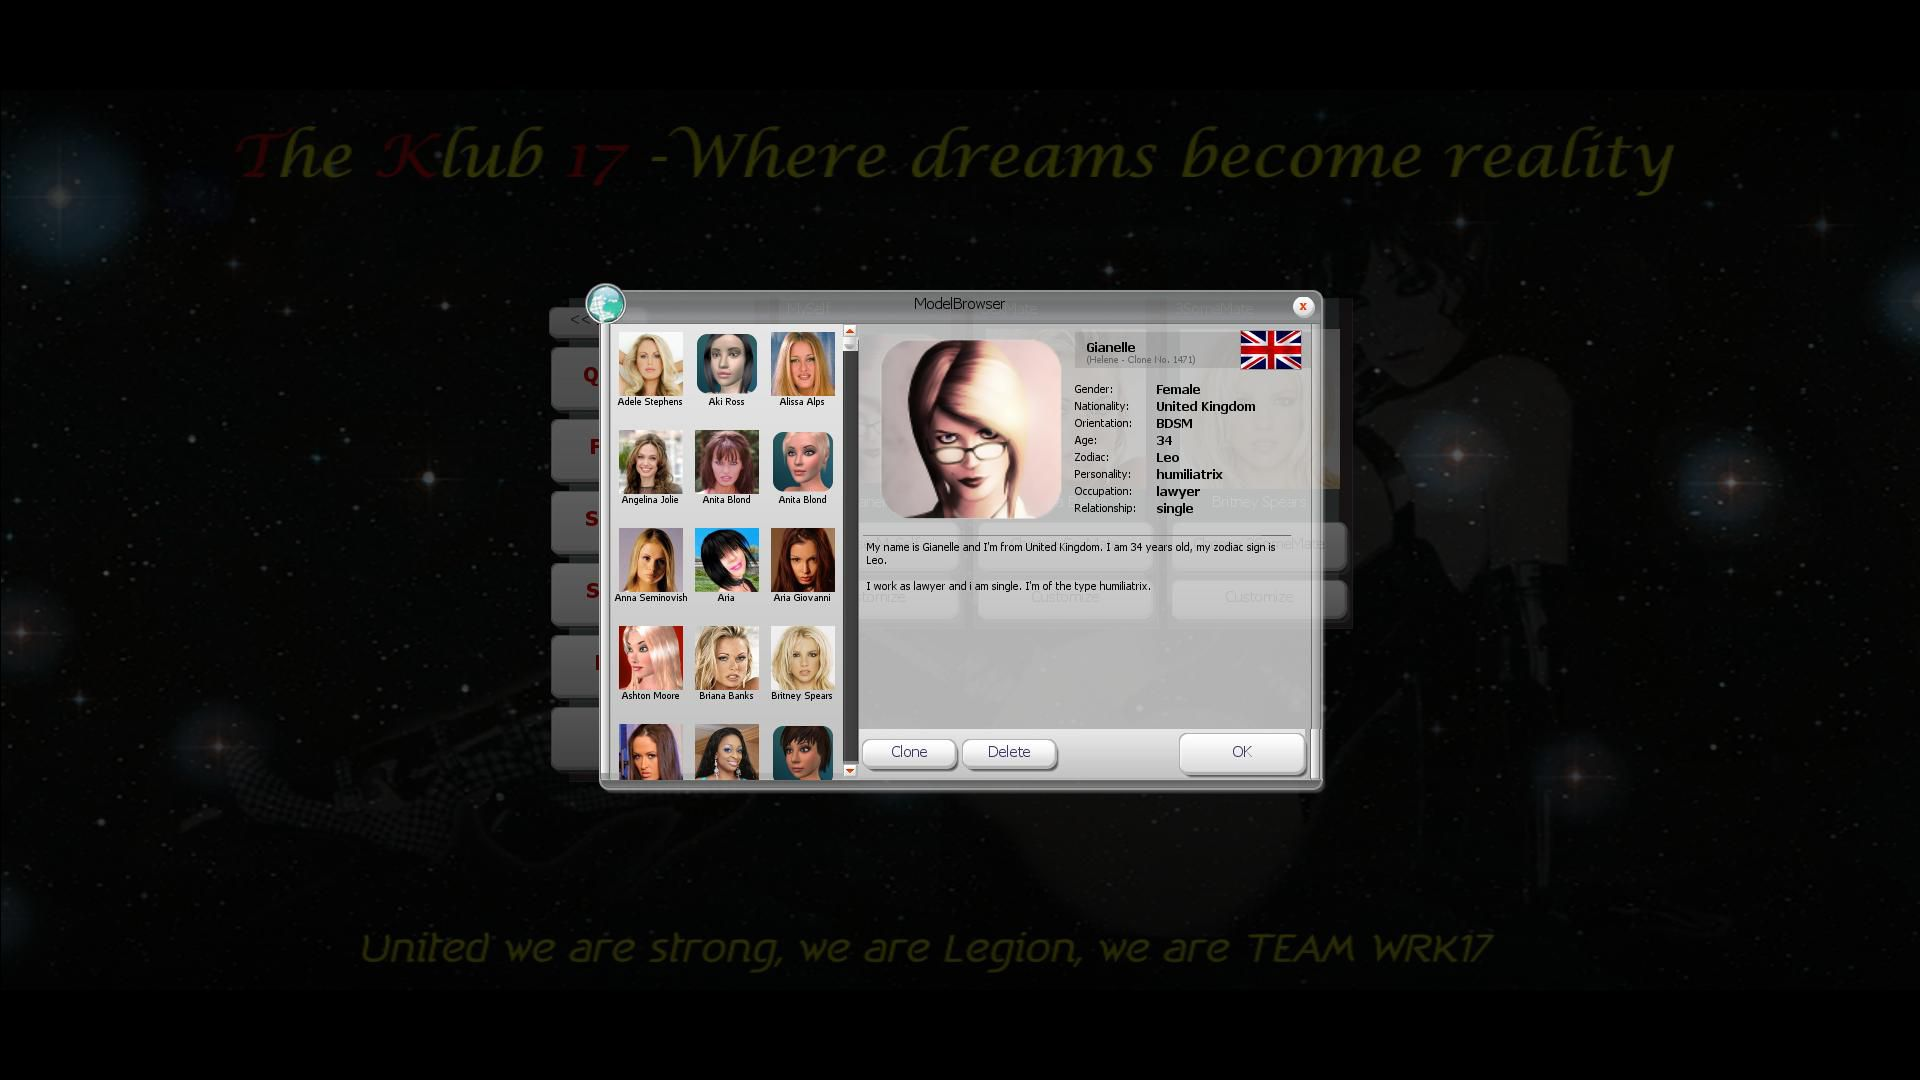 3D SexVilla 2 + Mod The Klub 17 version 7.4.9 + Official Mega packs for TK17 V7.X [2012] [Uncen] [3D, Simulator, ADV] [ENG] SexGame